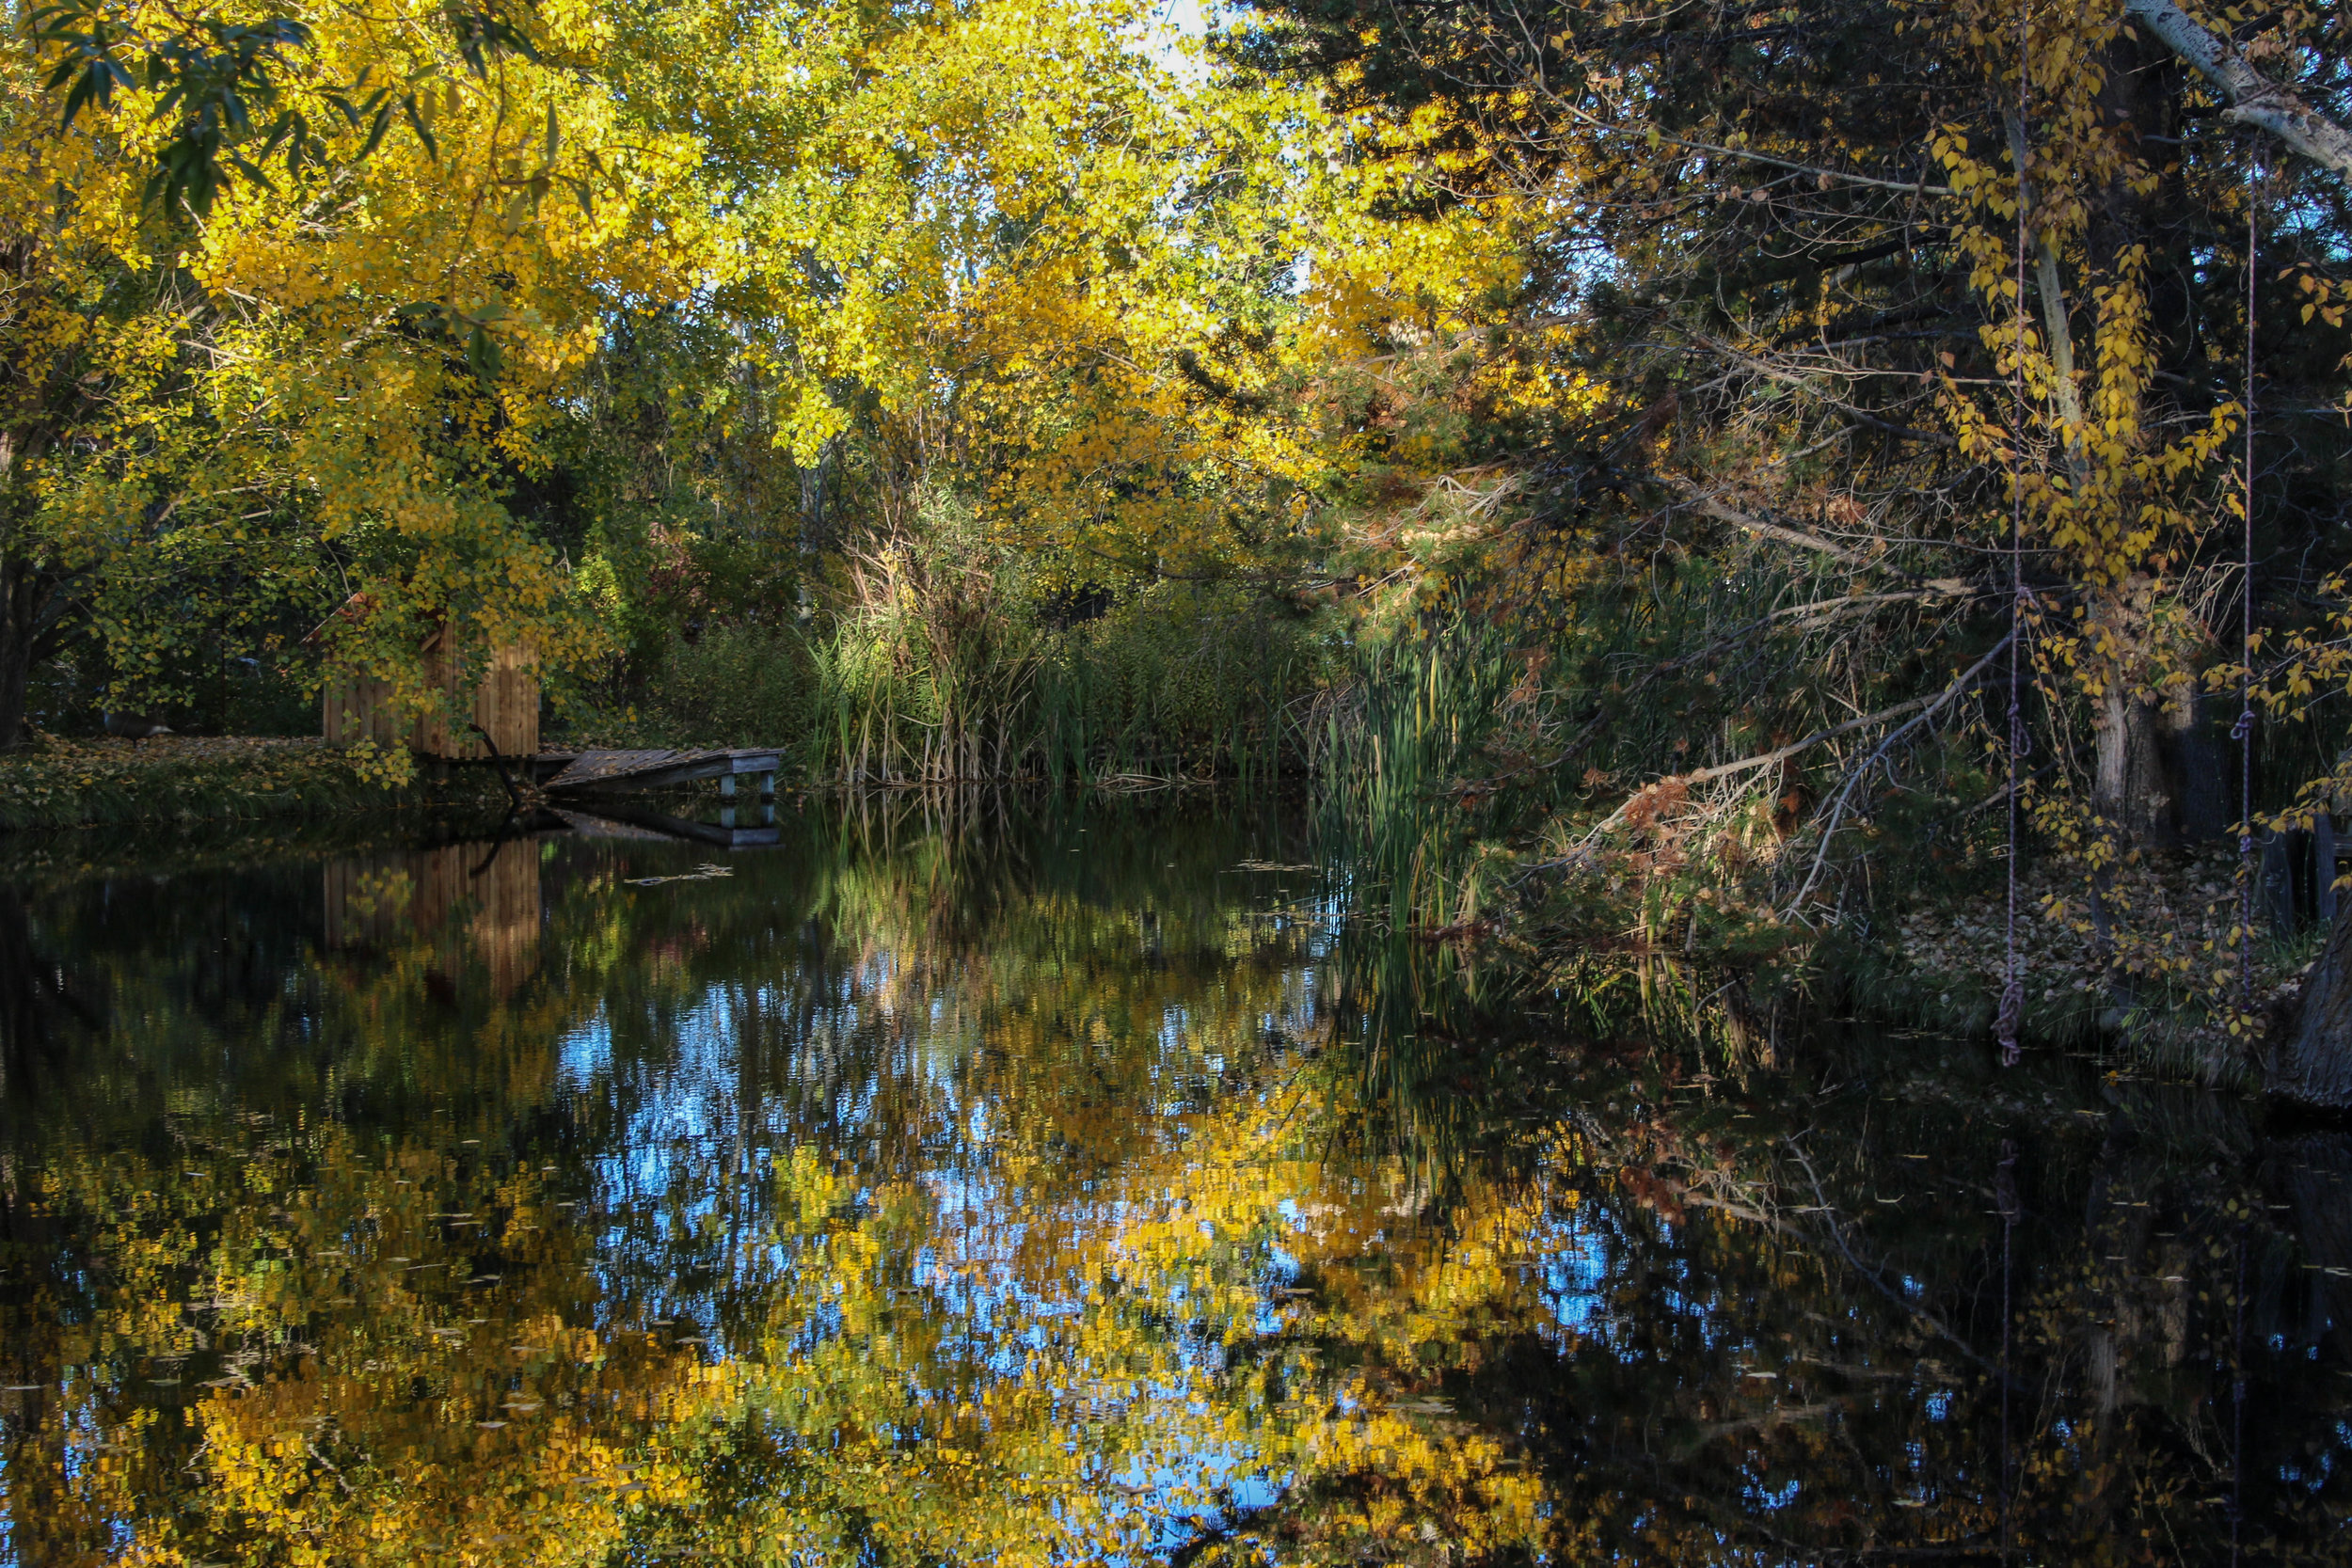 The nursery irrigation pond; Autumn 2016